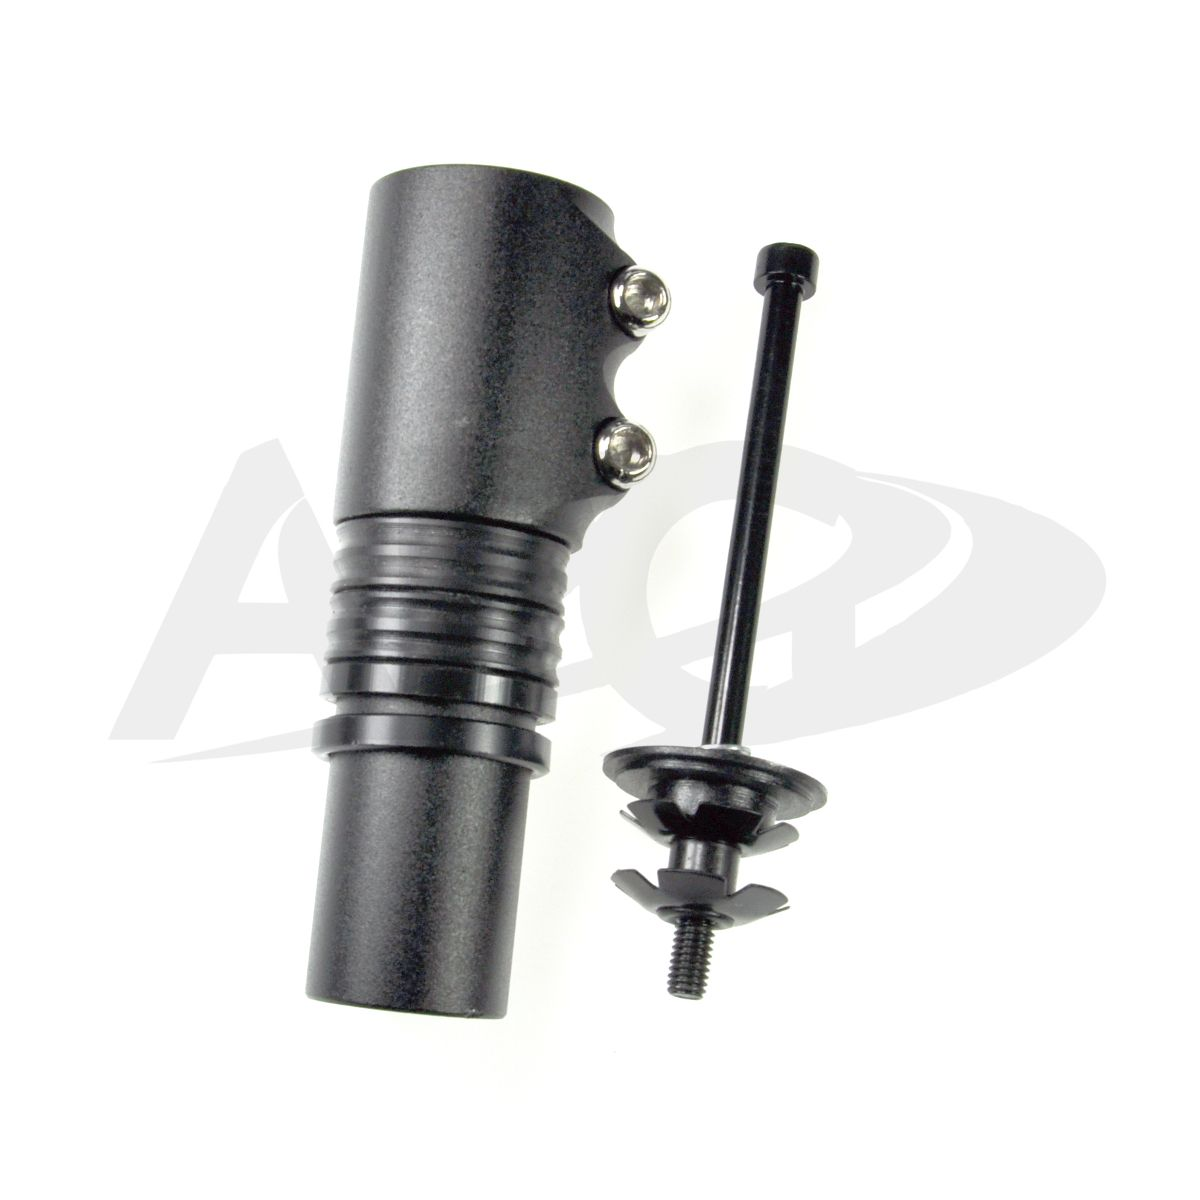 Adapter wspornika kierownicy AHED- 145101A